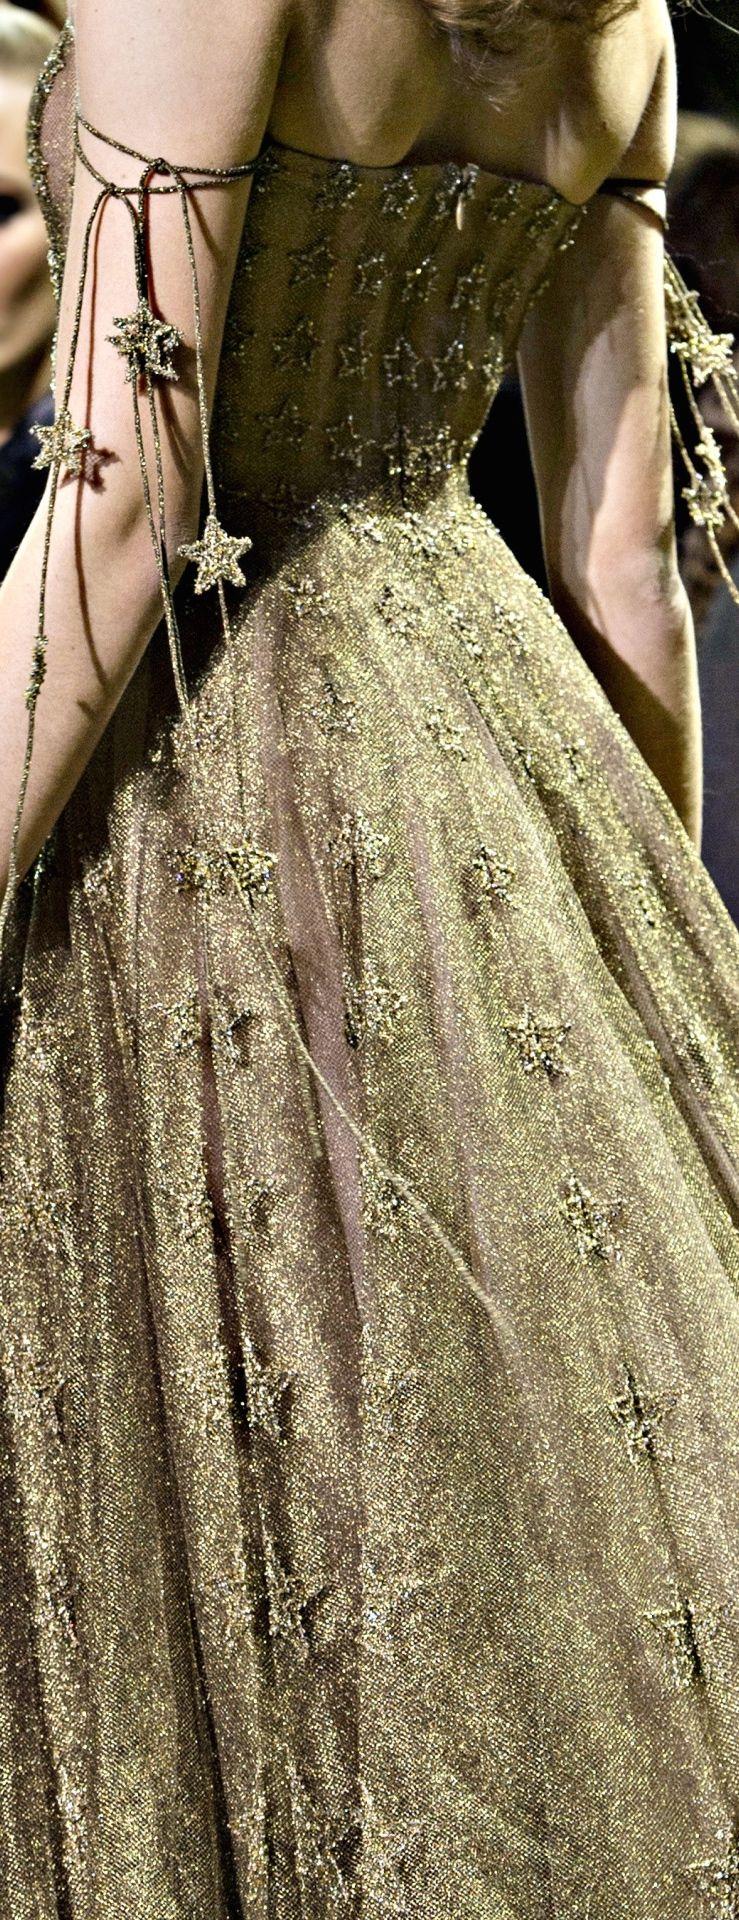 Dior Couture 2017 Crème de la Crème #Luxurydotcom / golden sparkly ...